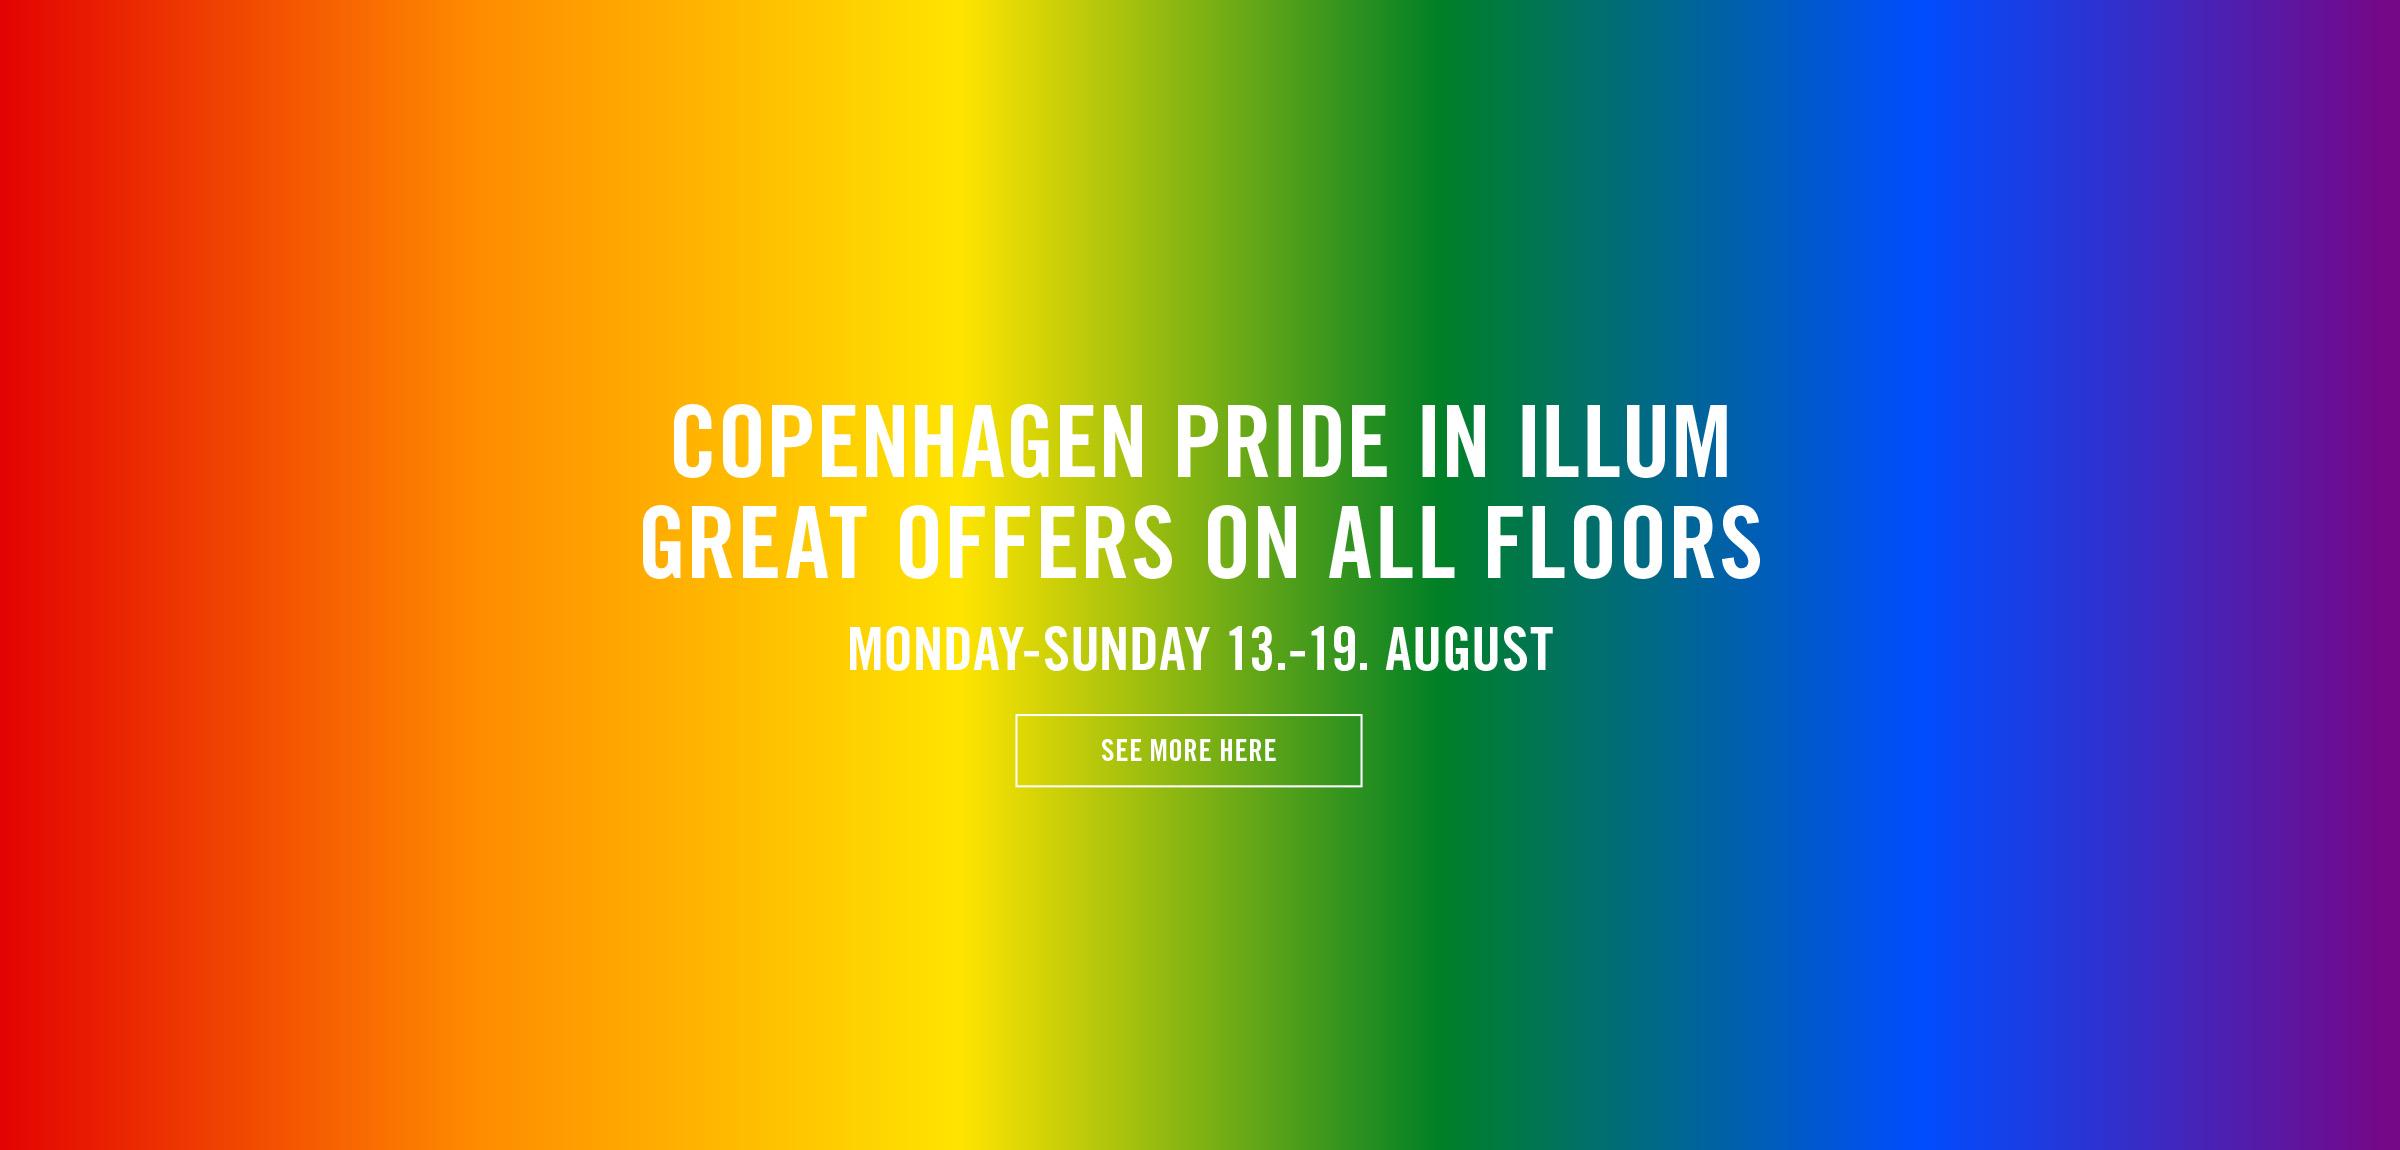 Copenhagen pride forside